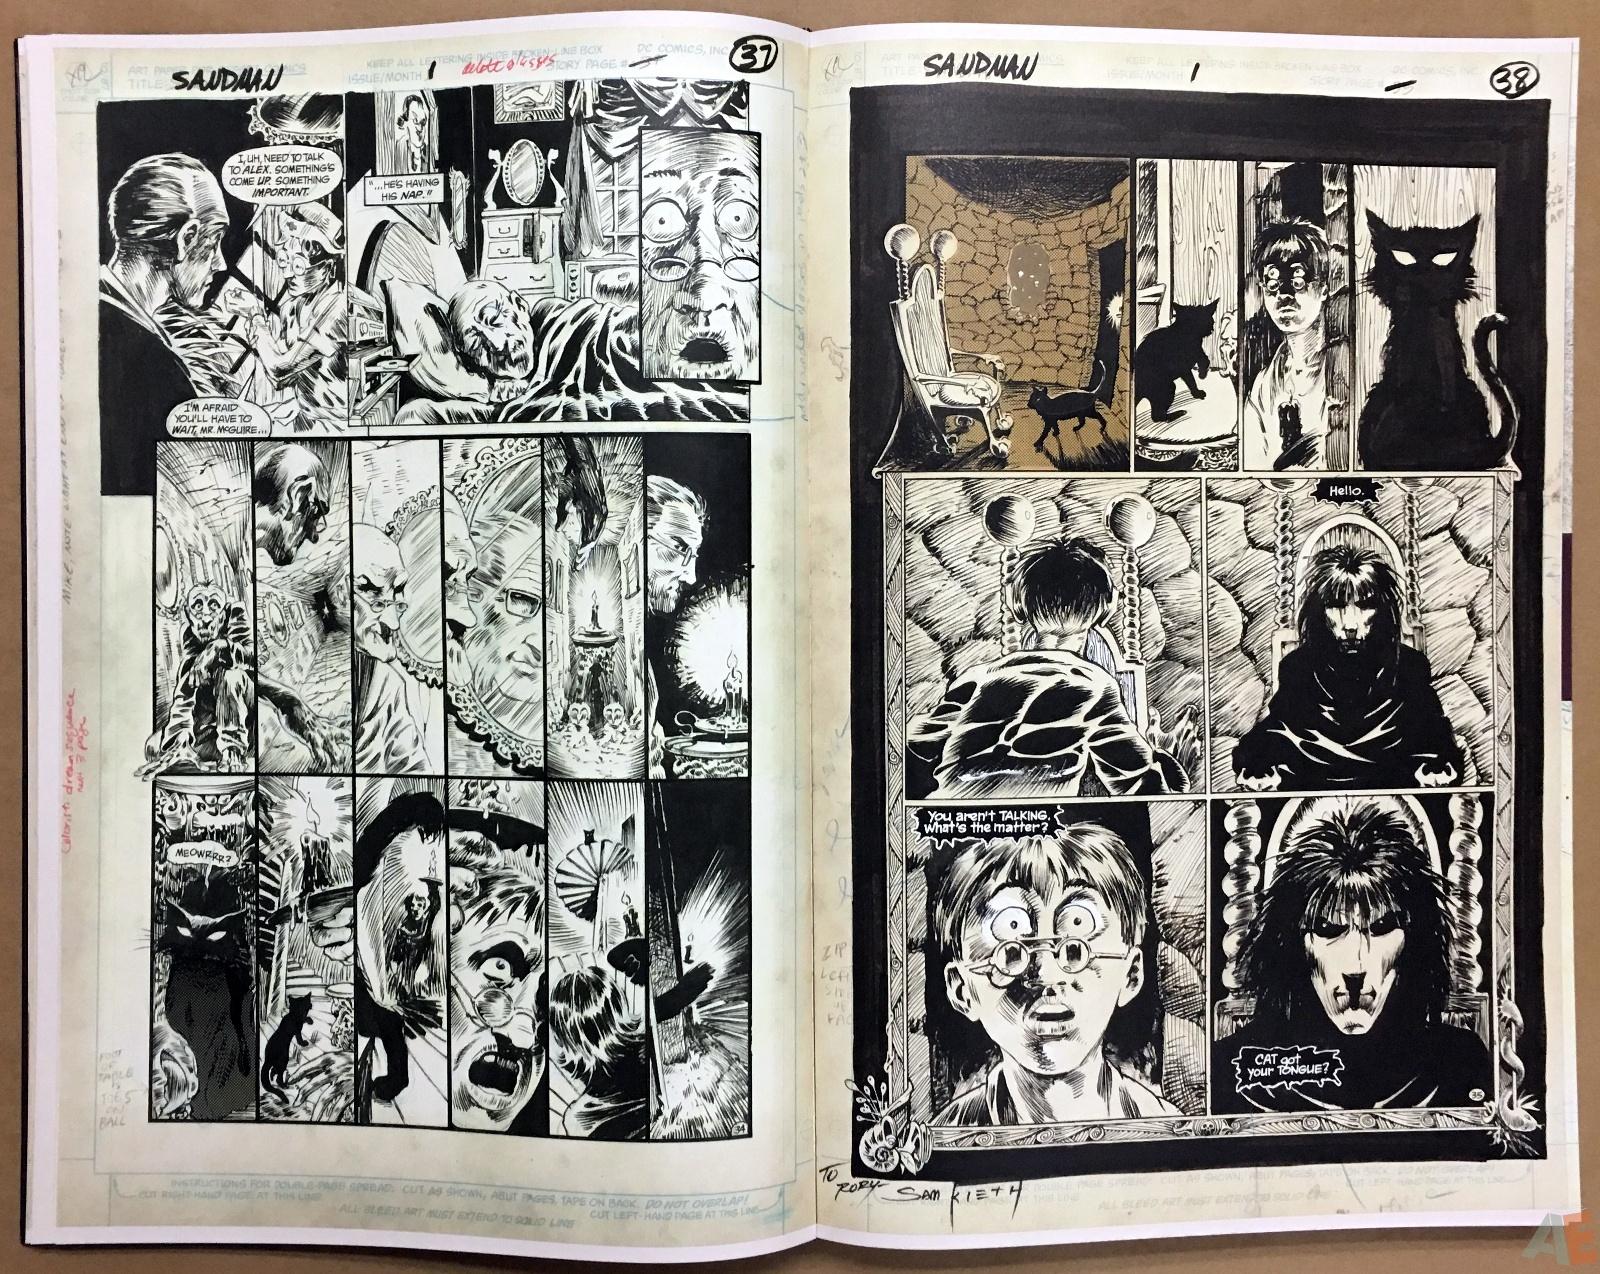 The Sandman Gallery Edition